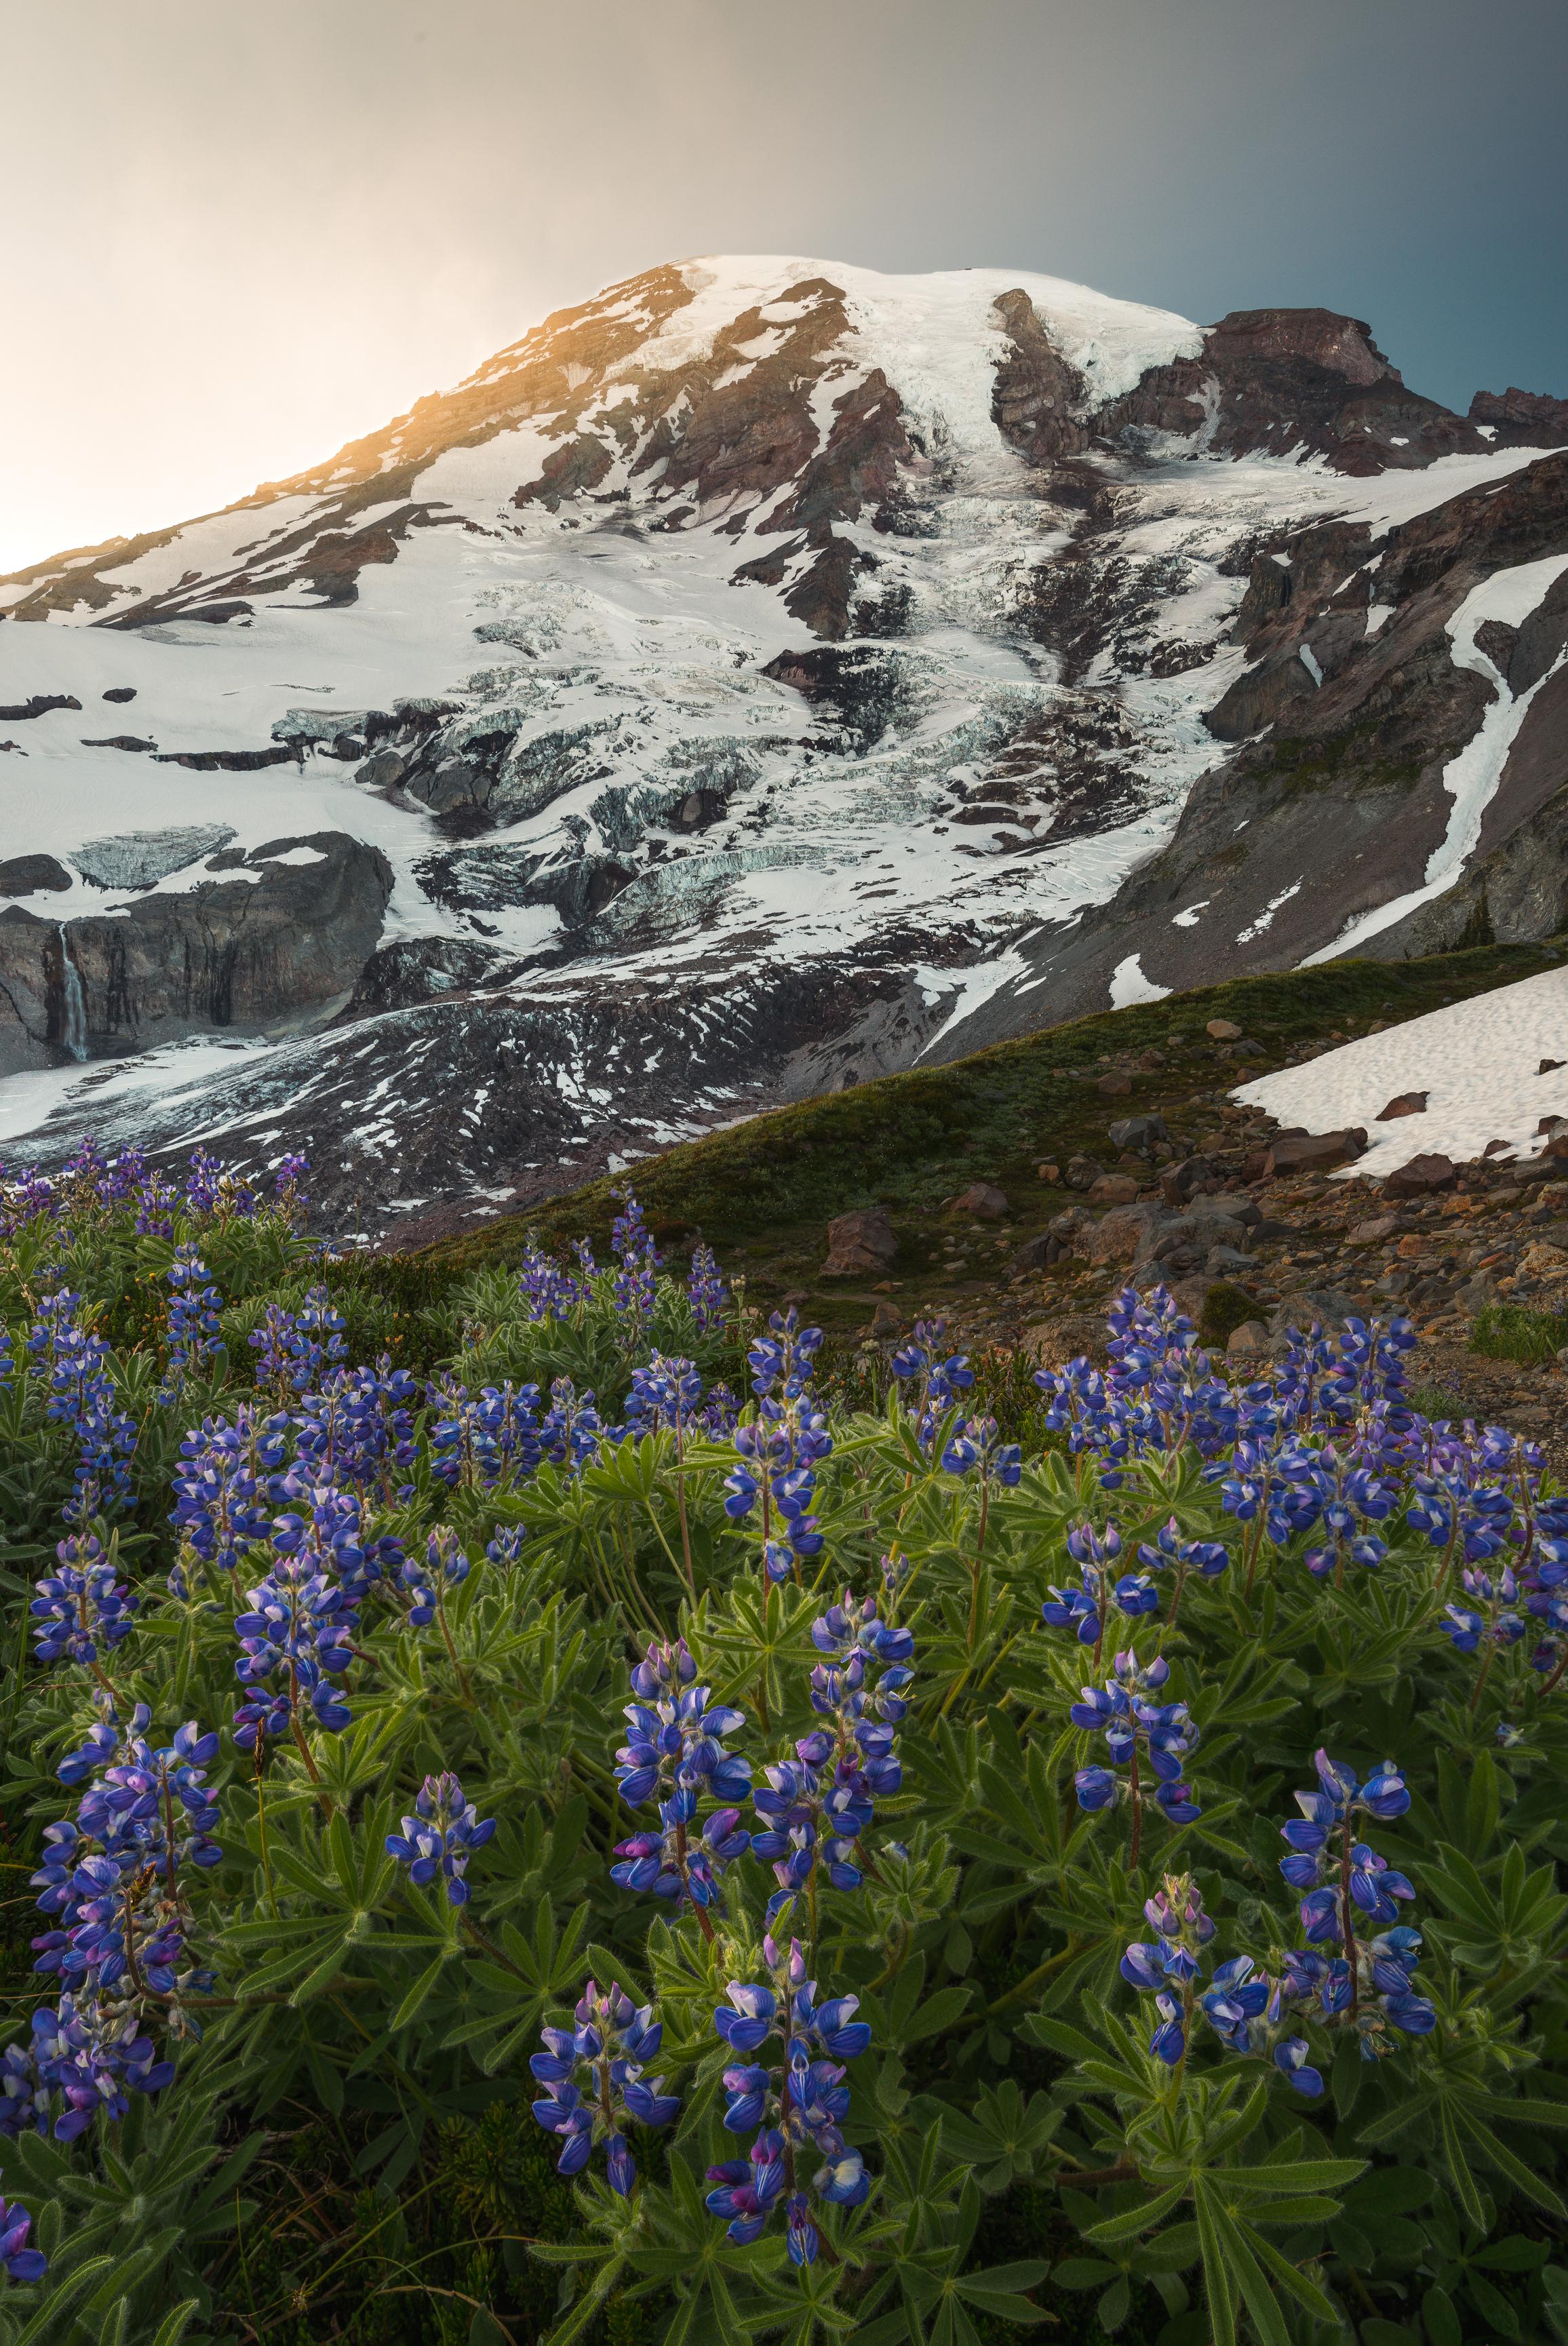 mt rainier national park spring wildflowers summer august